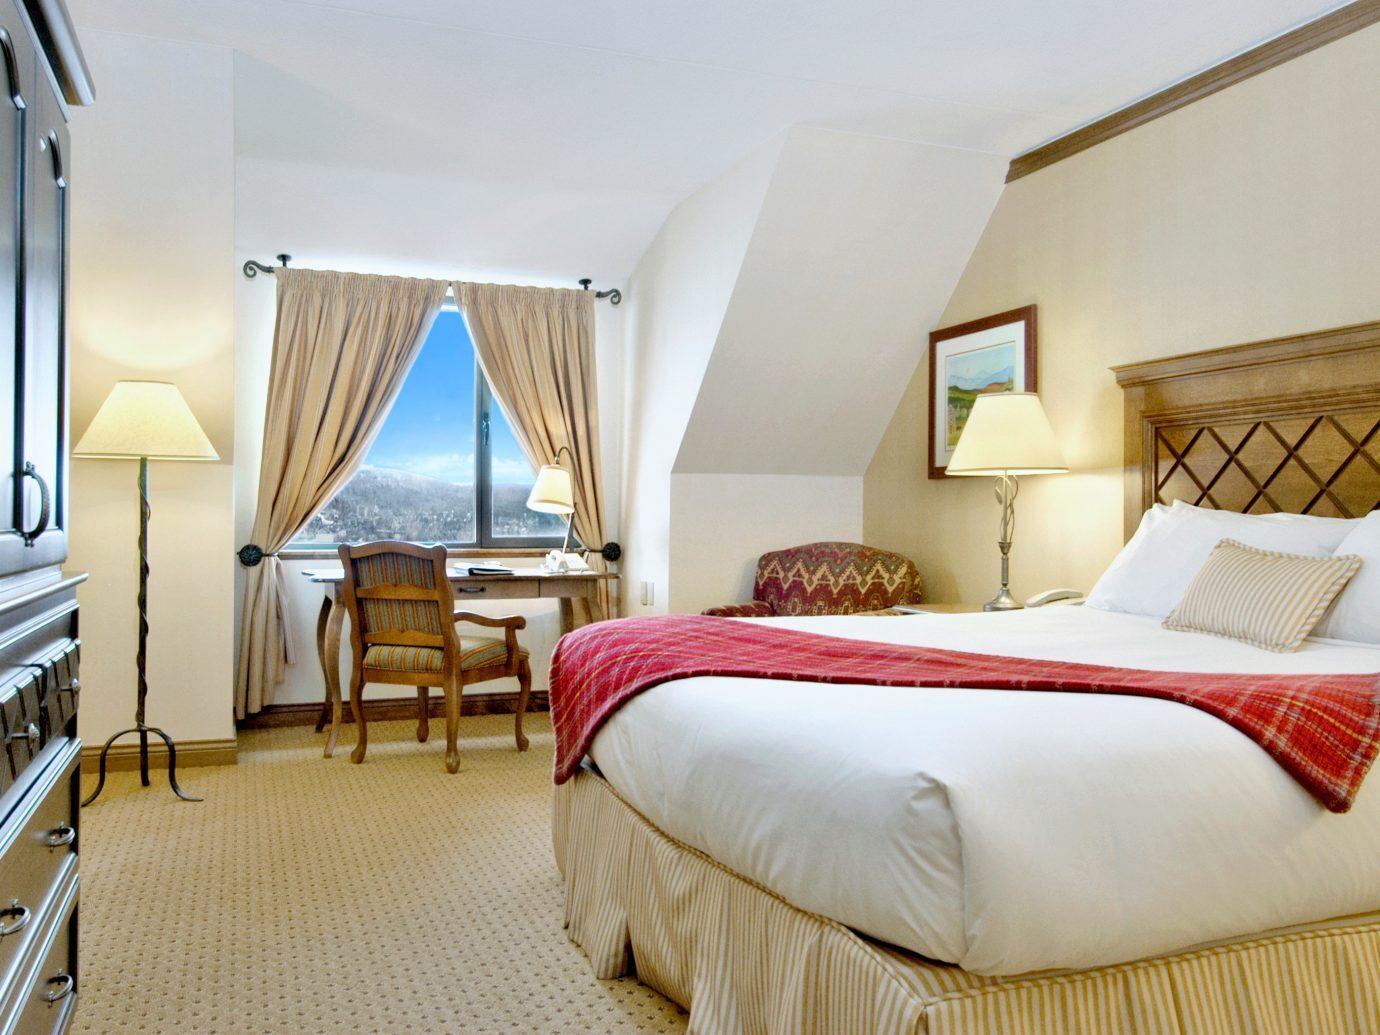 Bedroom at the Fairmont Tremblant, Mont-Tremblant, QC